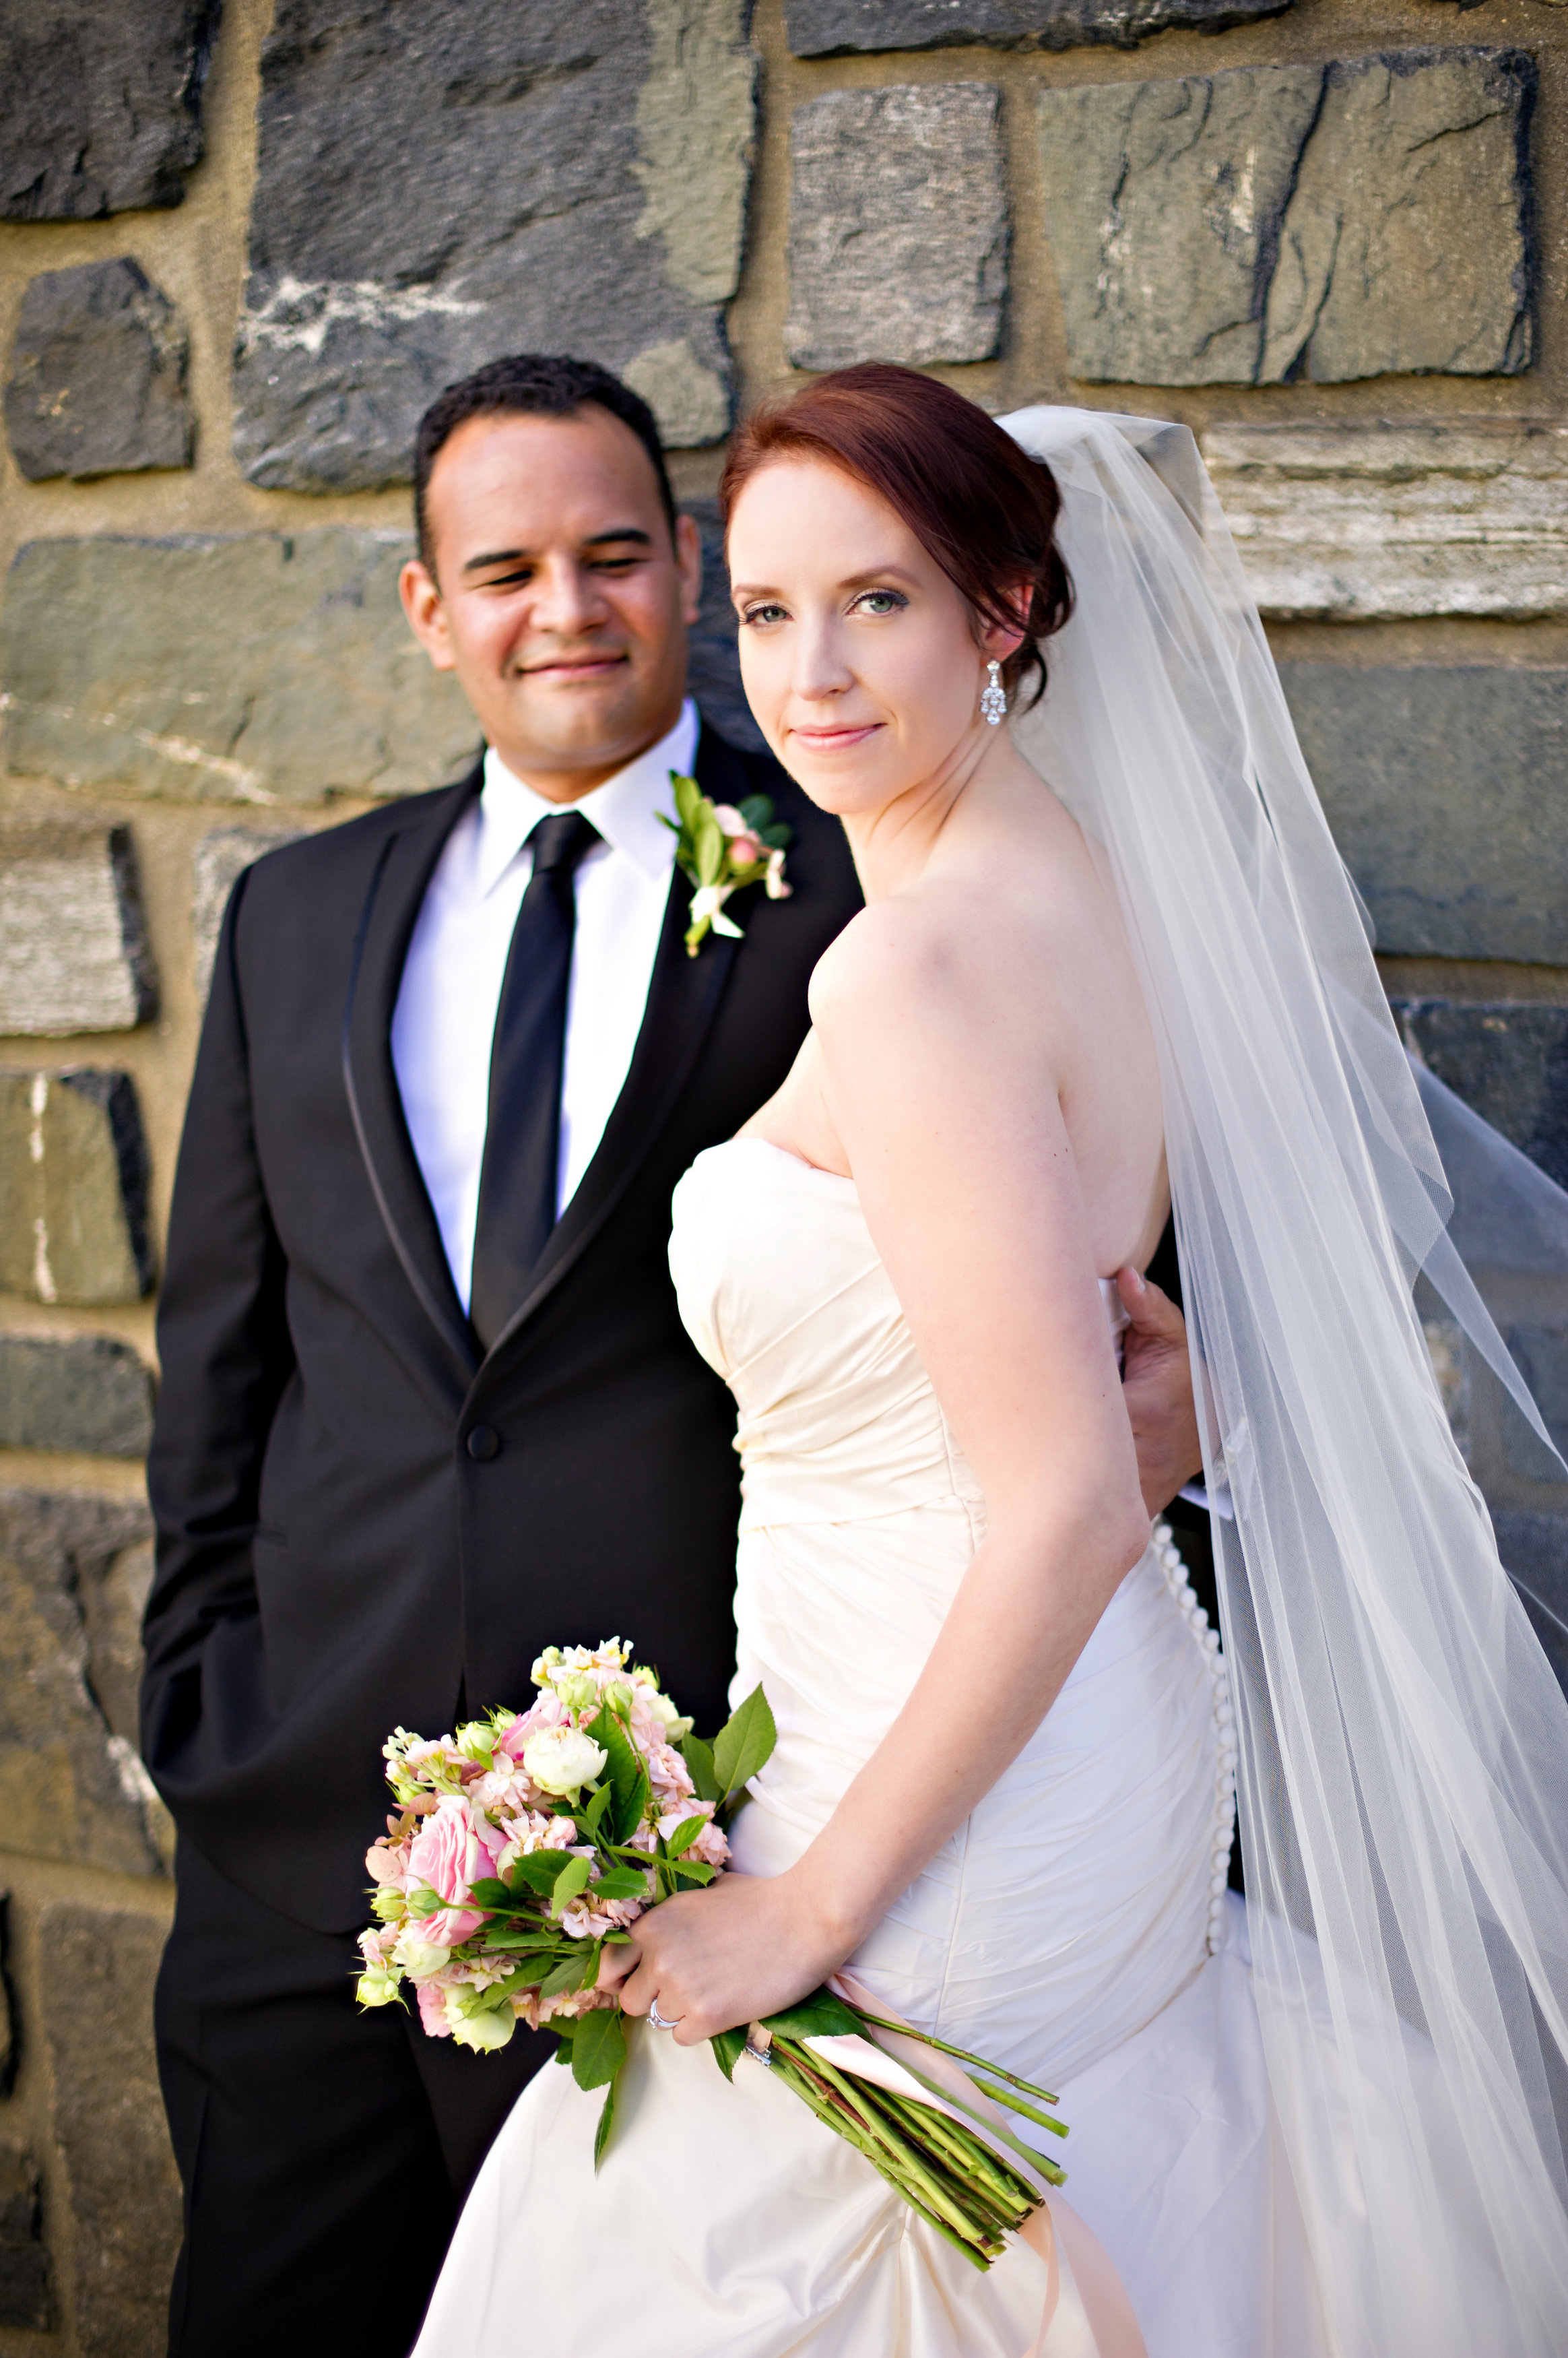 CT_Wedding_Planner_Crabtree_Kittle_House011.jpg